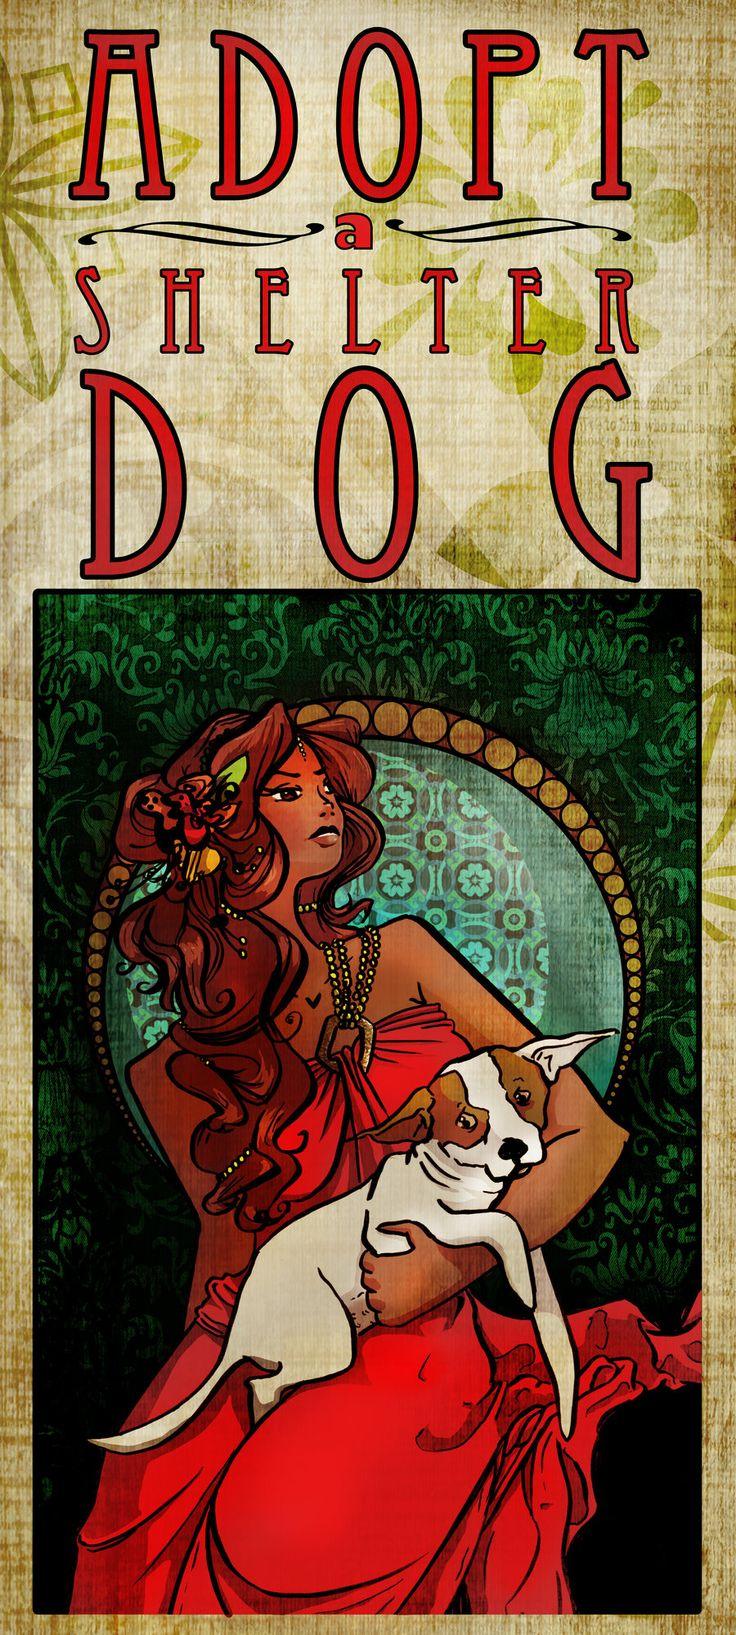 Adopt a Shelter Dog poster. Beautiful!